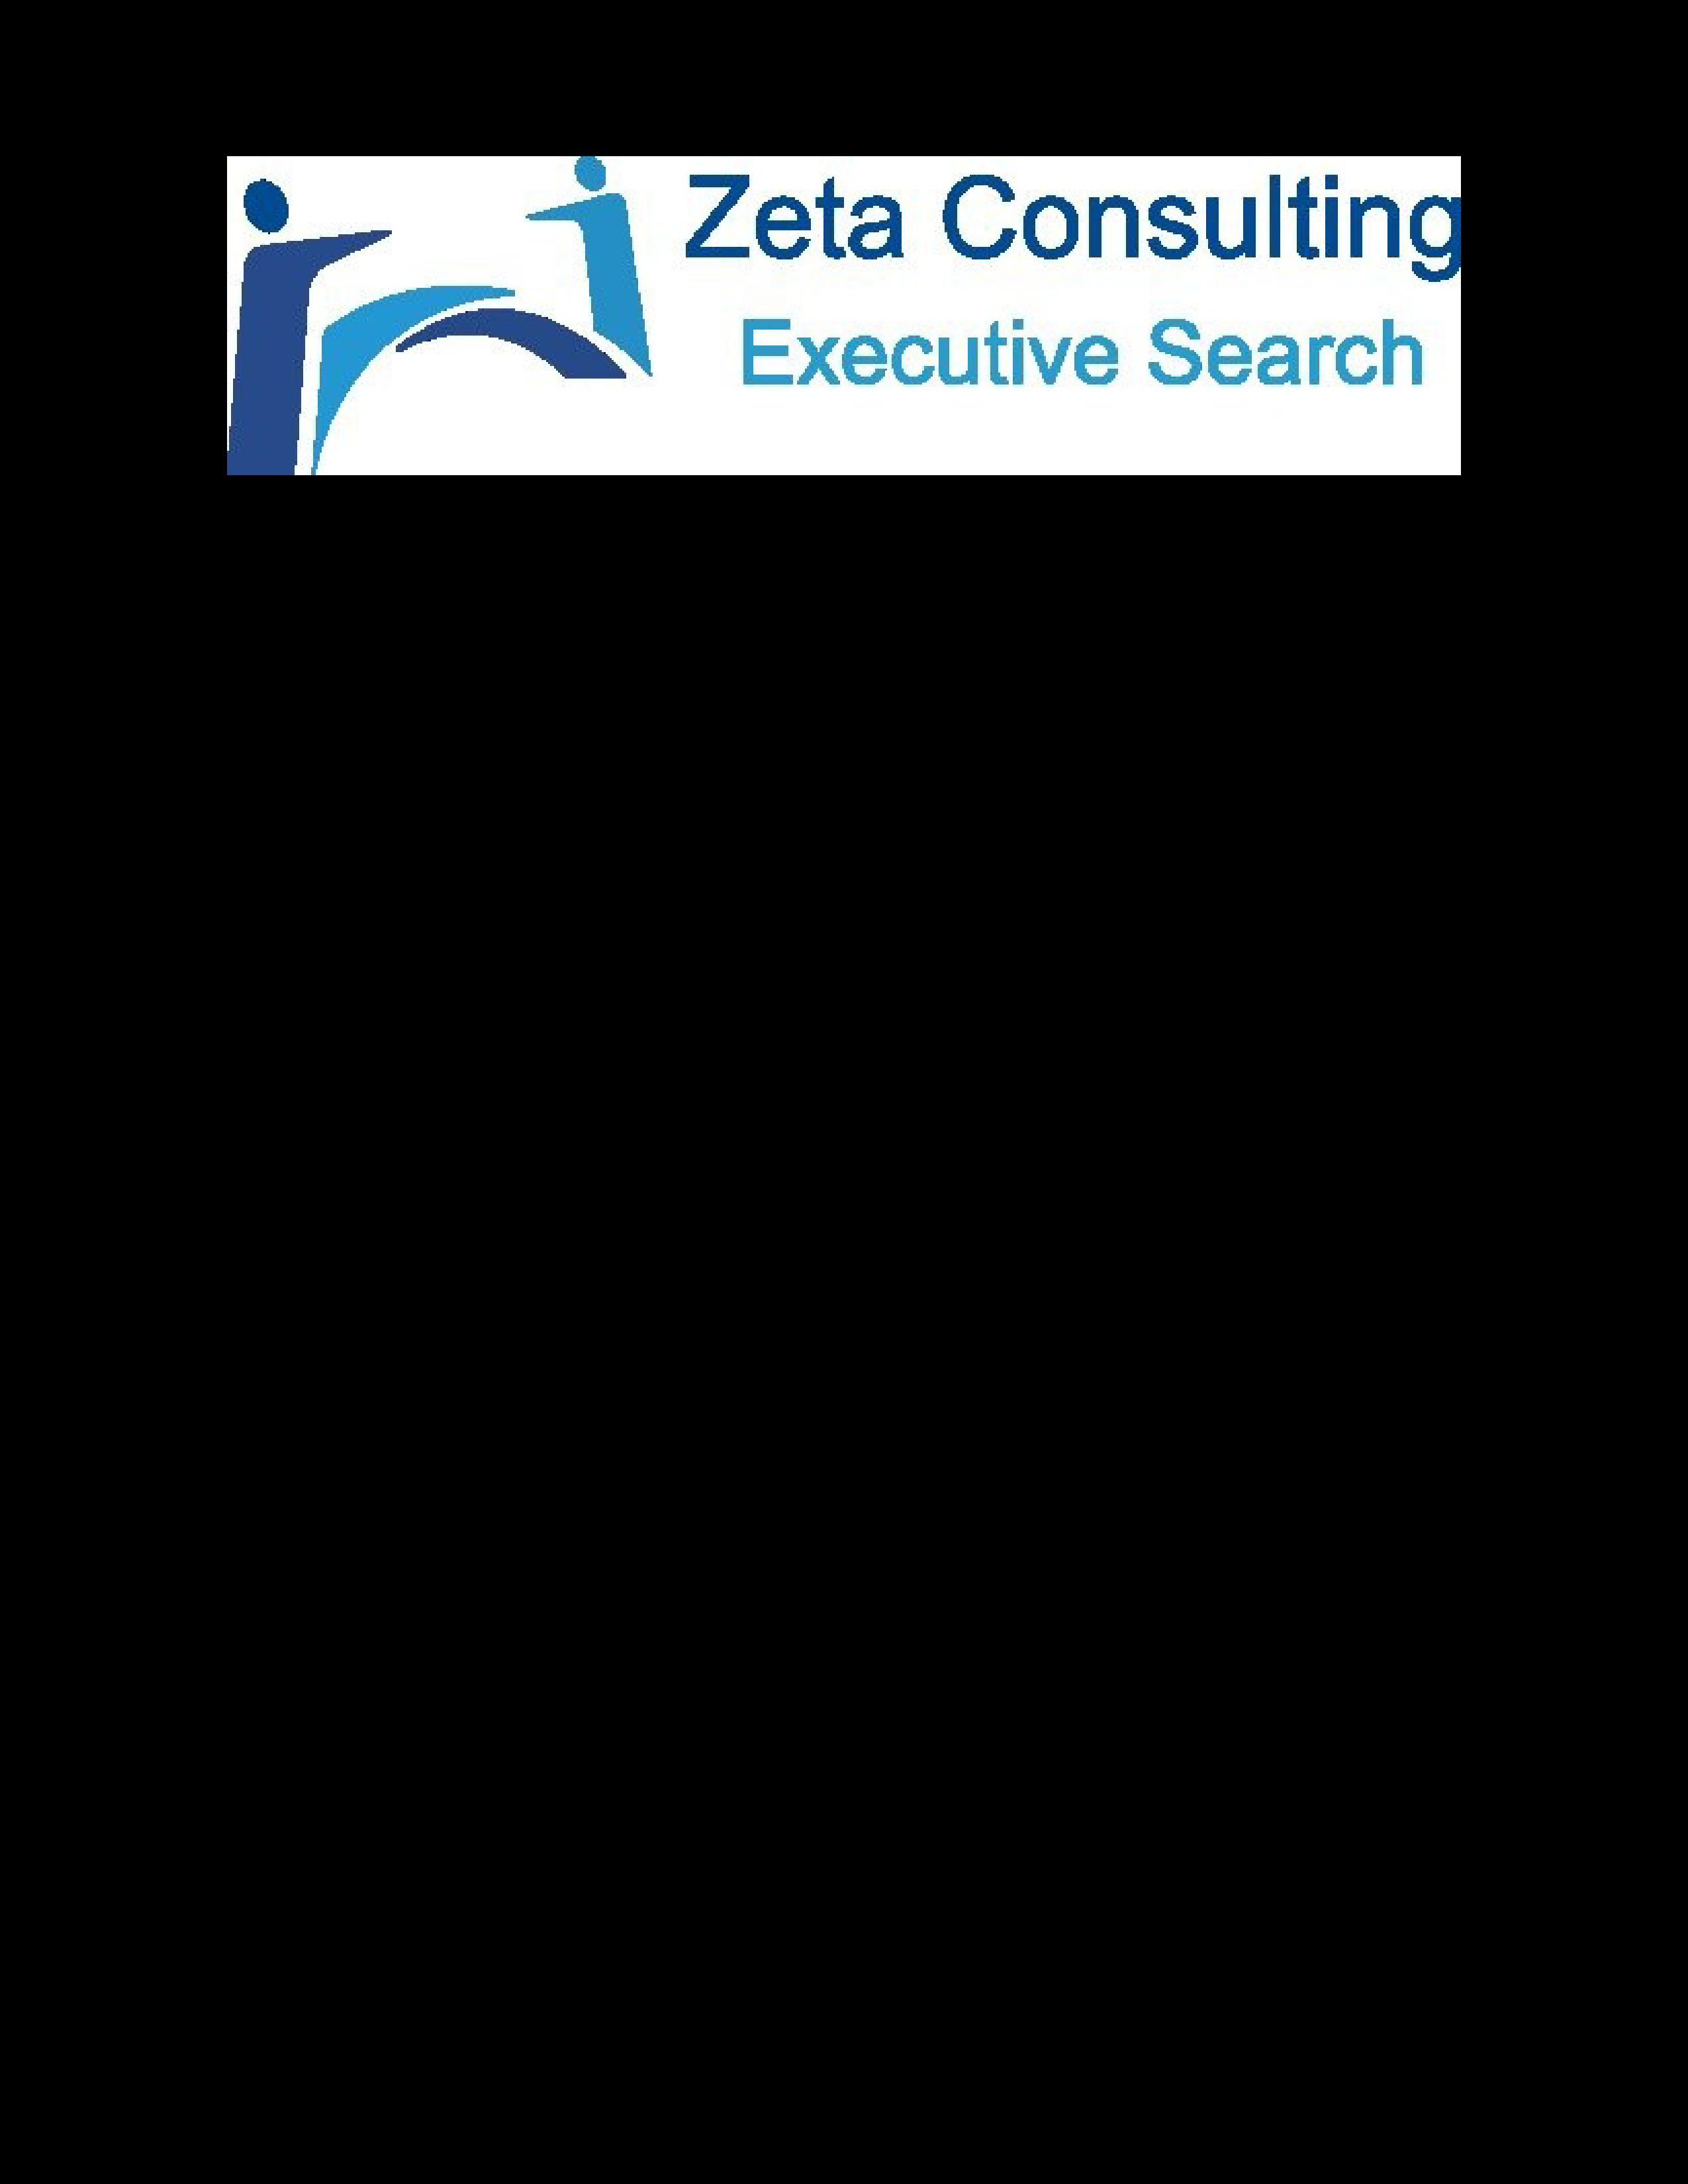 Corporate Consultant Resignation Letter | Templates at ...